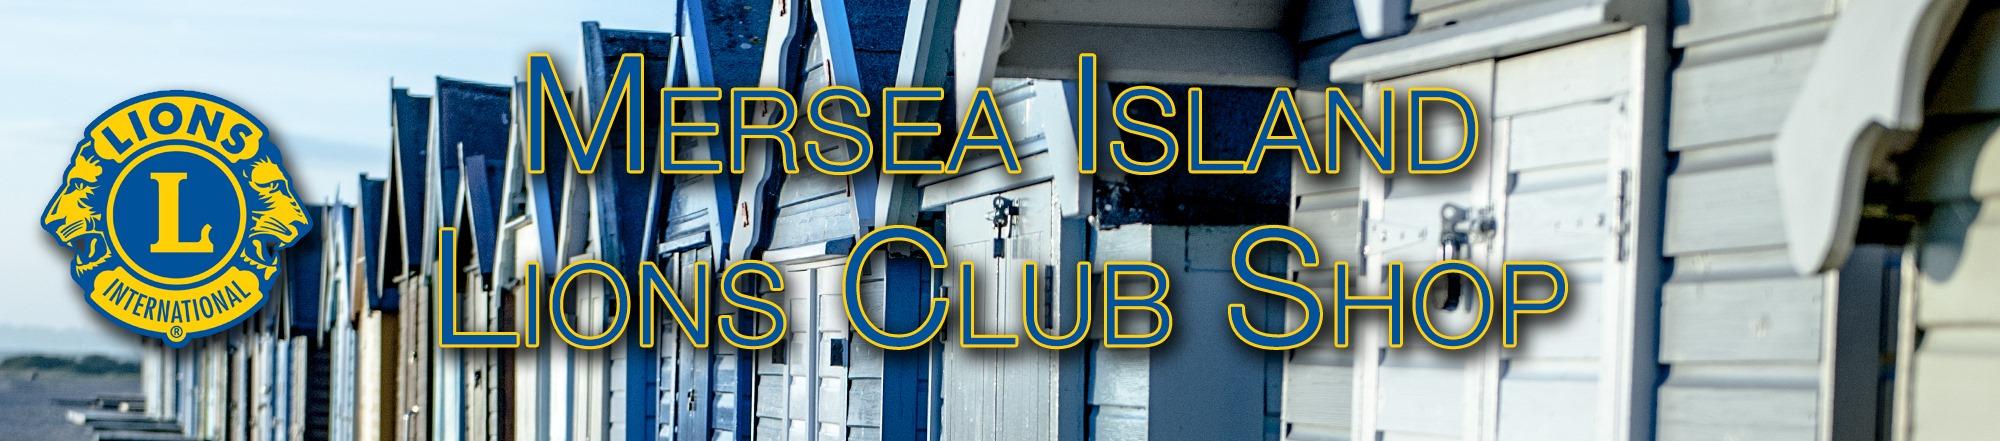 Mersea Island Lions Club